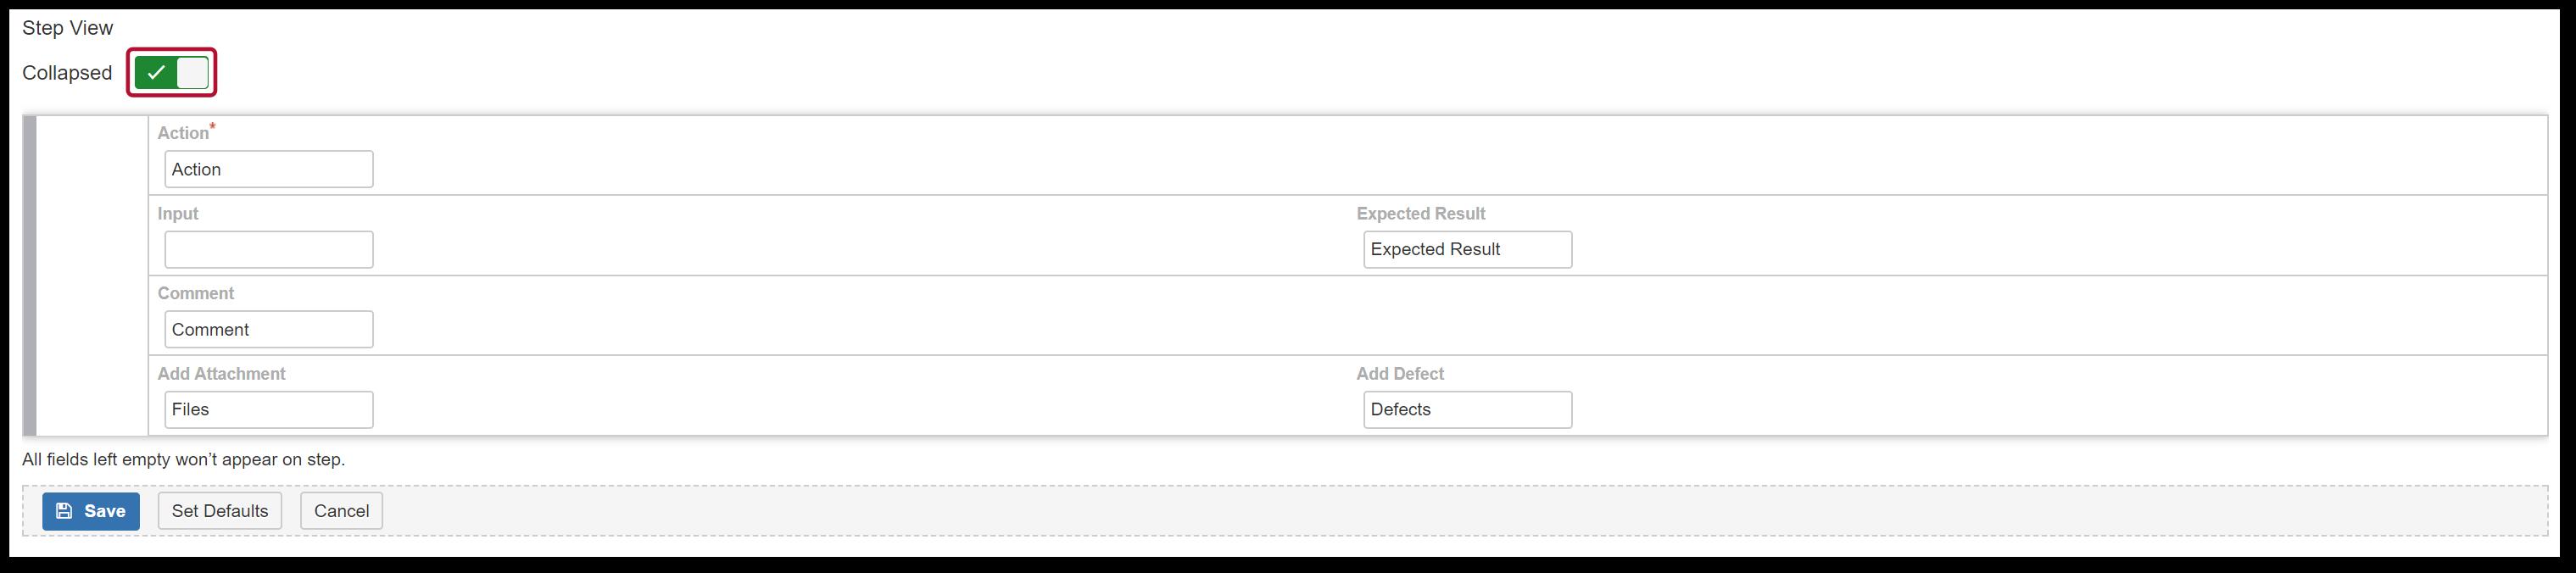 TestFLO Cloud: Configuration of Steps view